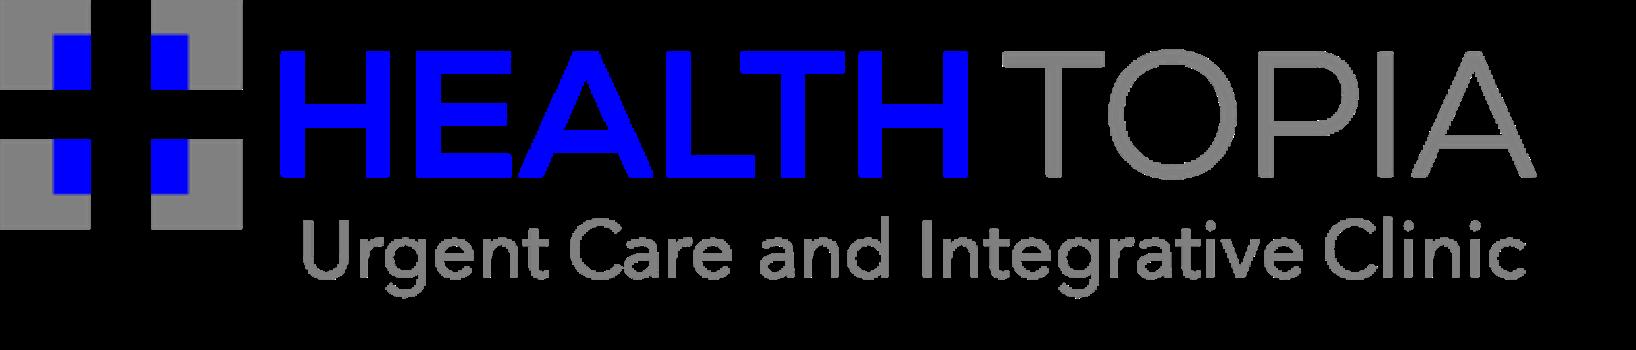 healthtopia-logo.png